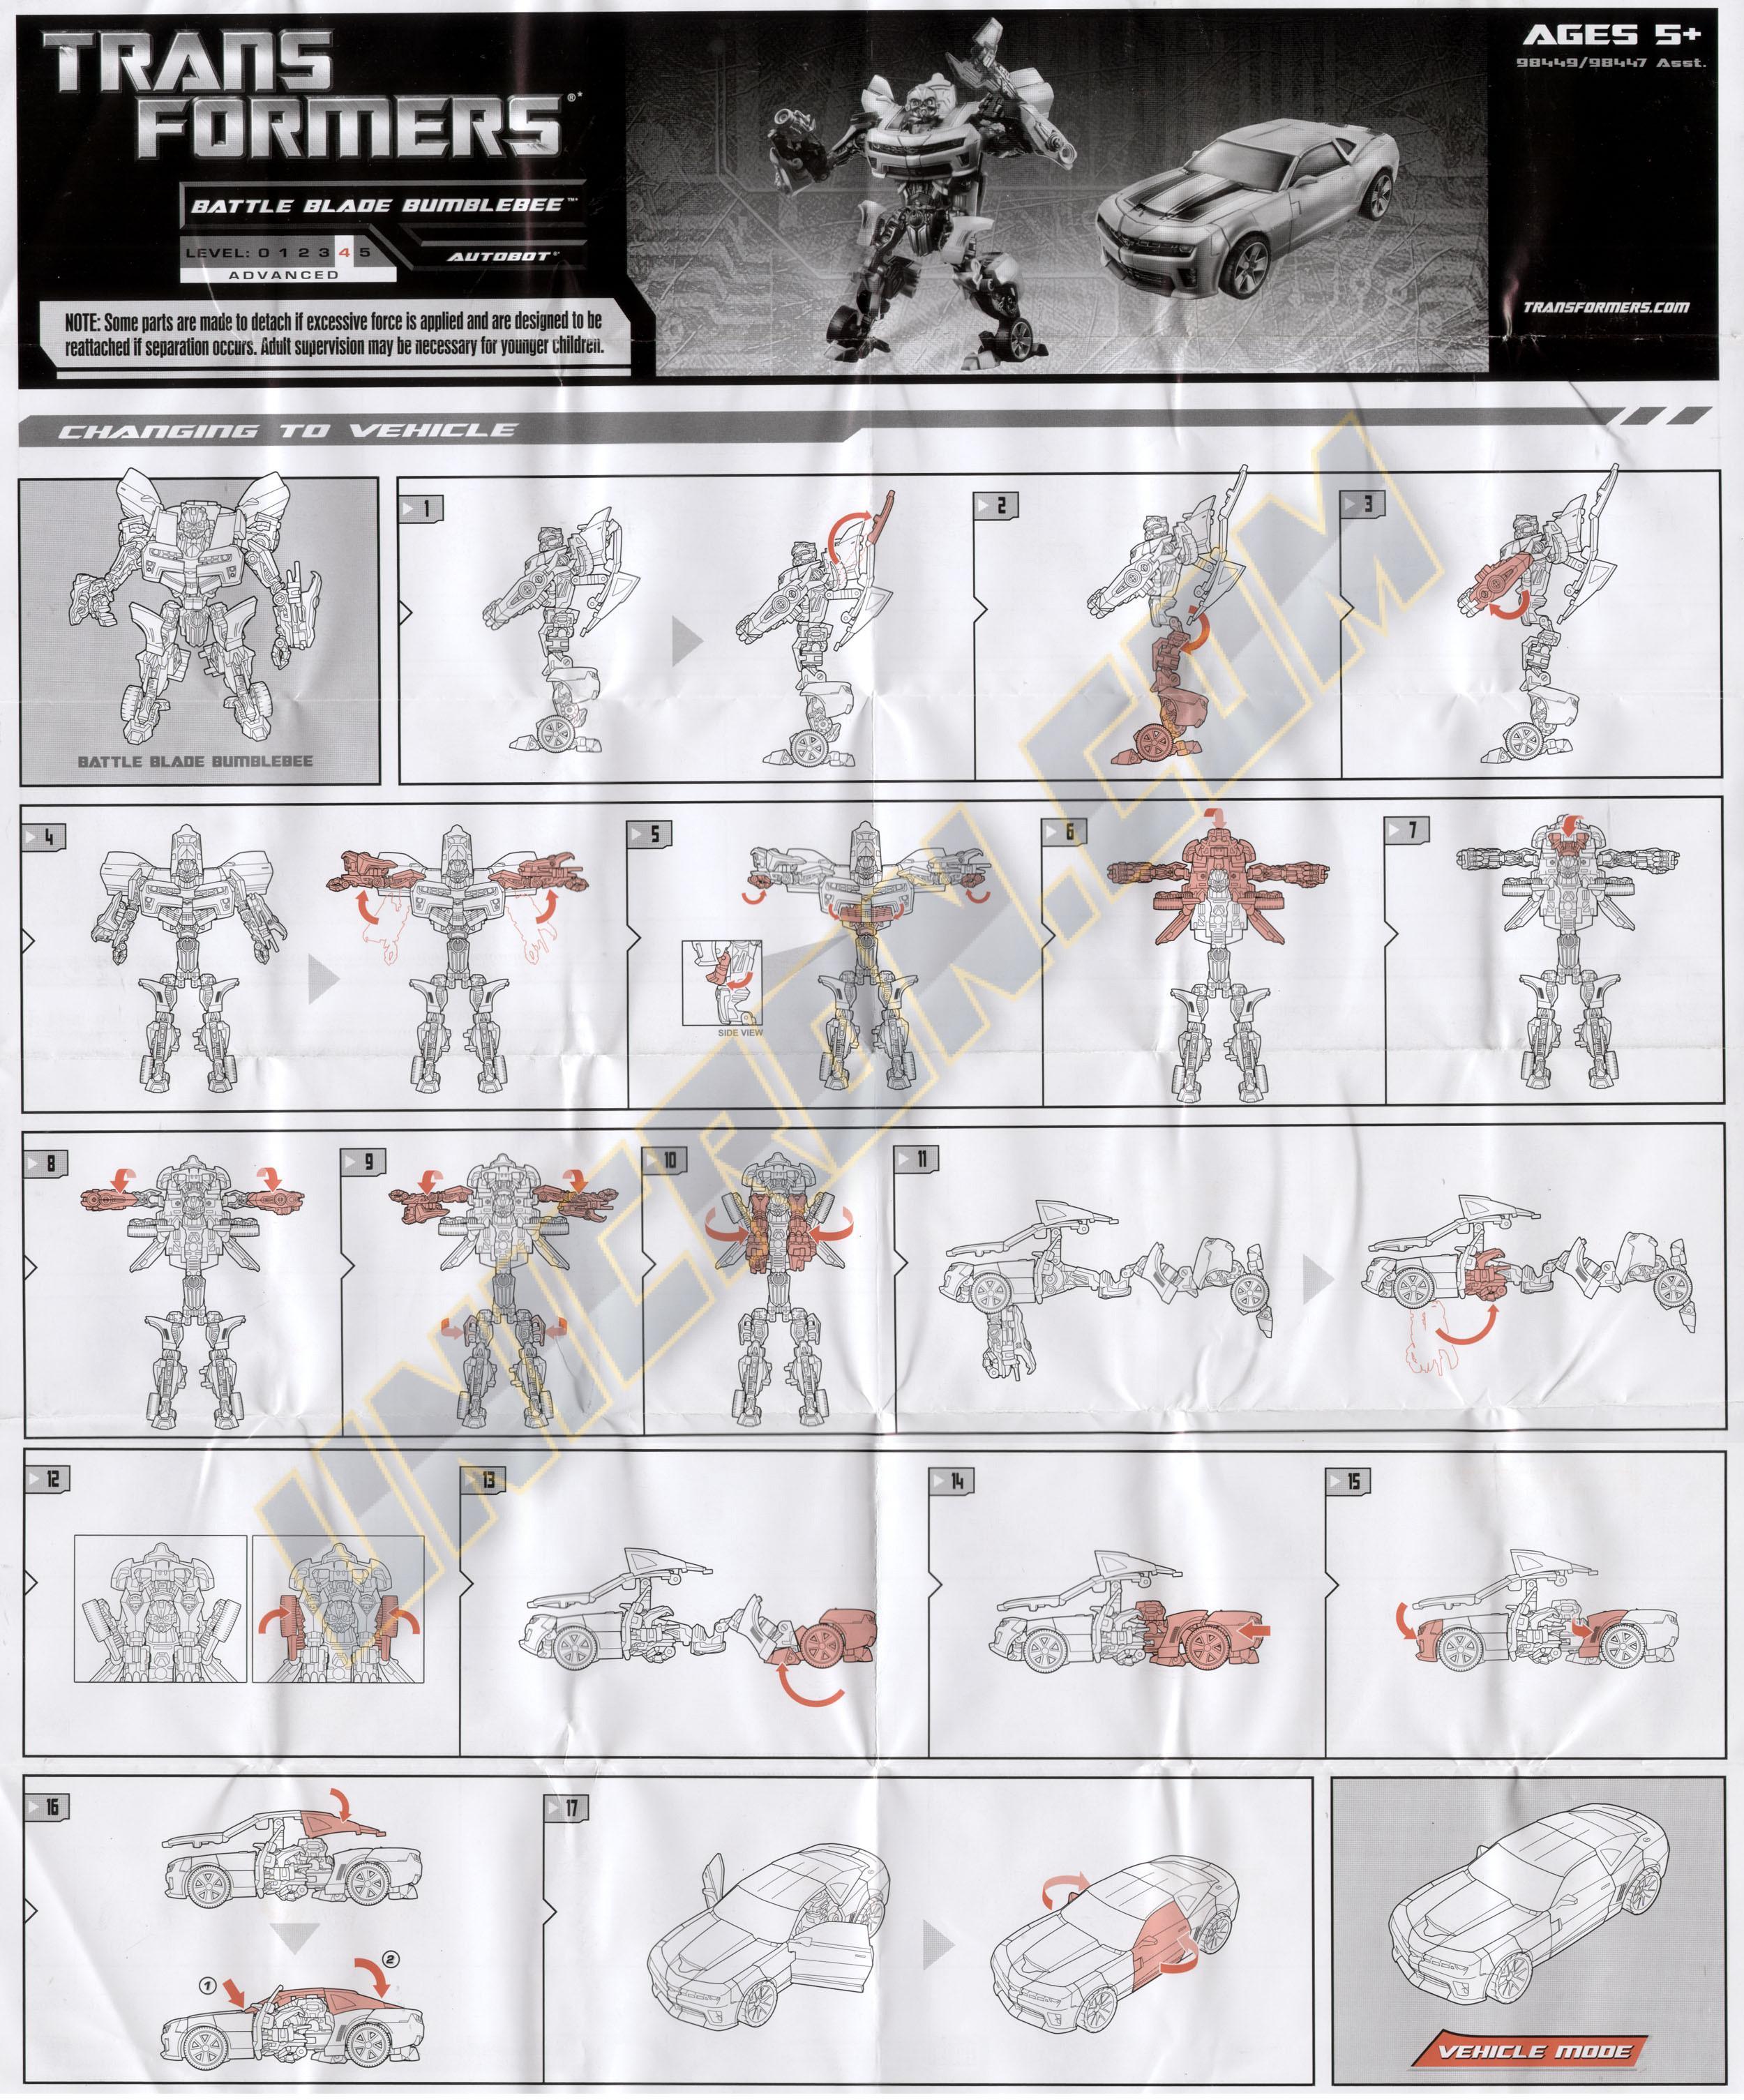 Transformers 3 dark of the moon bumblebee (deluxe) transformers.